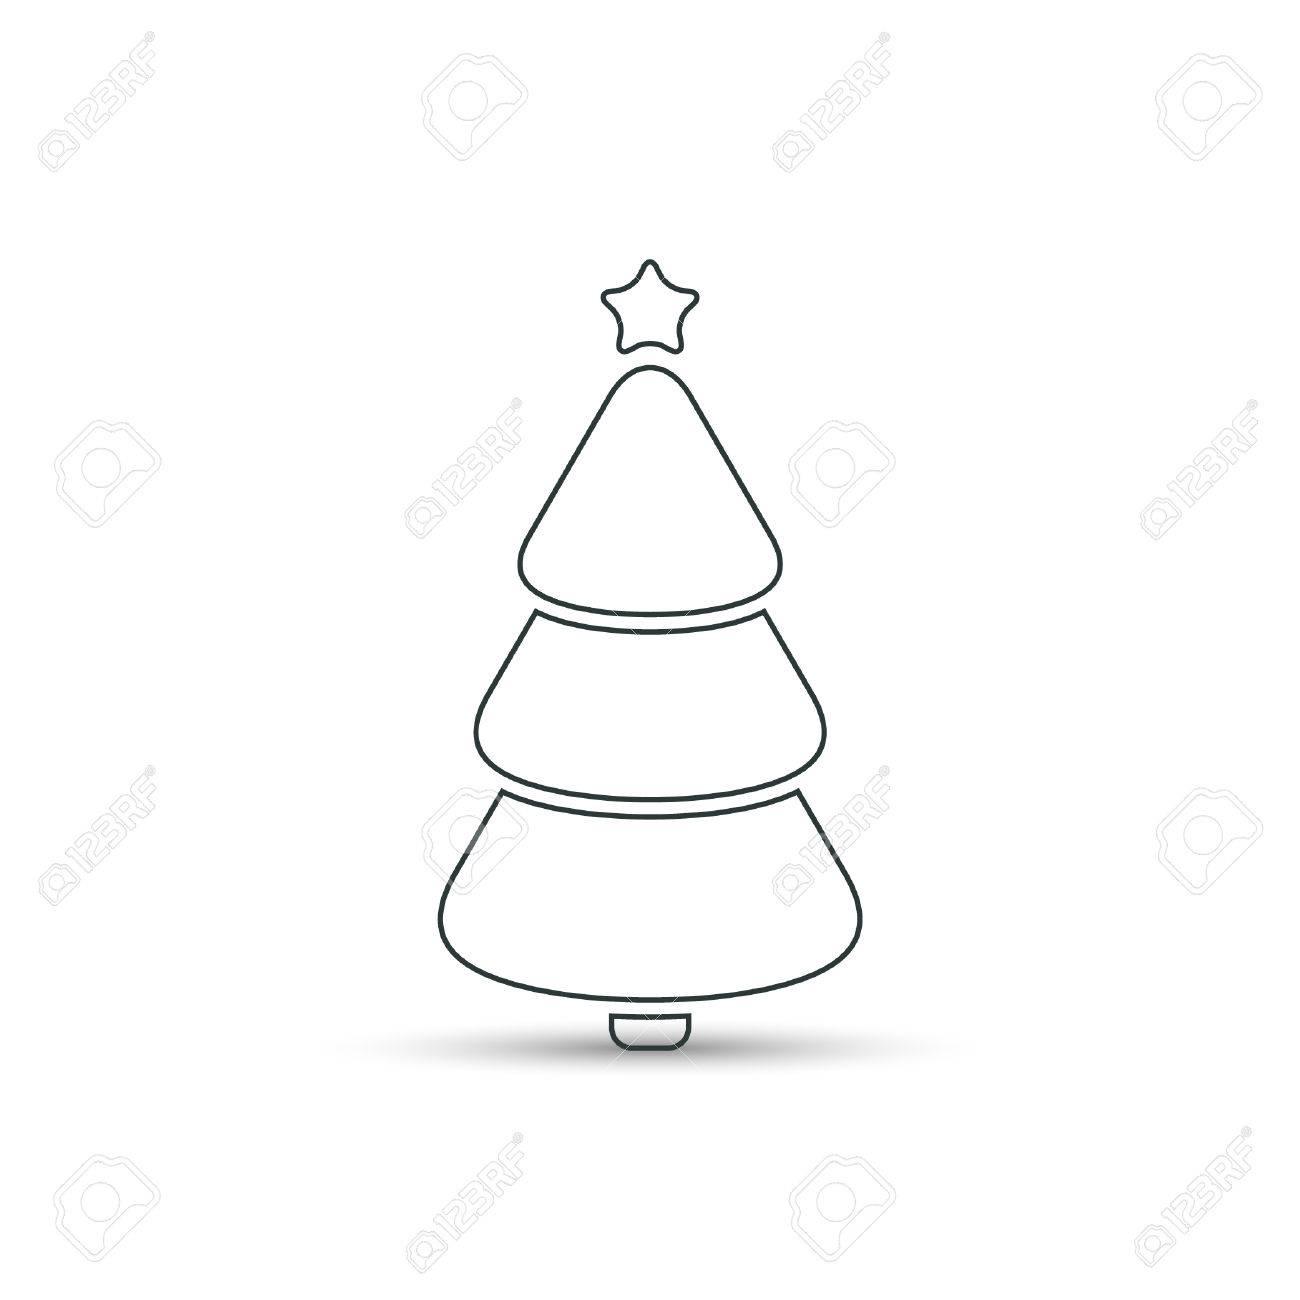 Christmas Tree Outline Icon Vector Simple Design Black Symbol